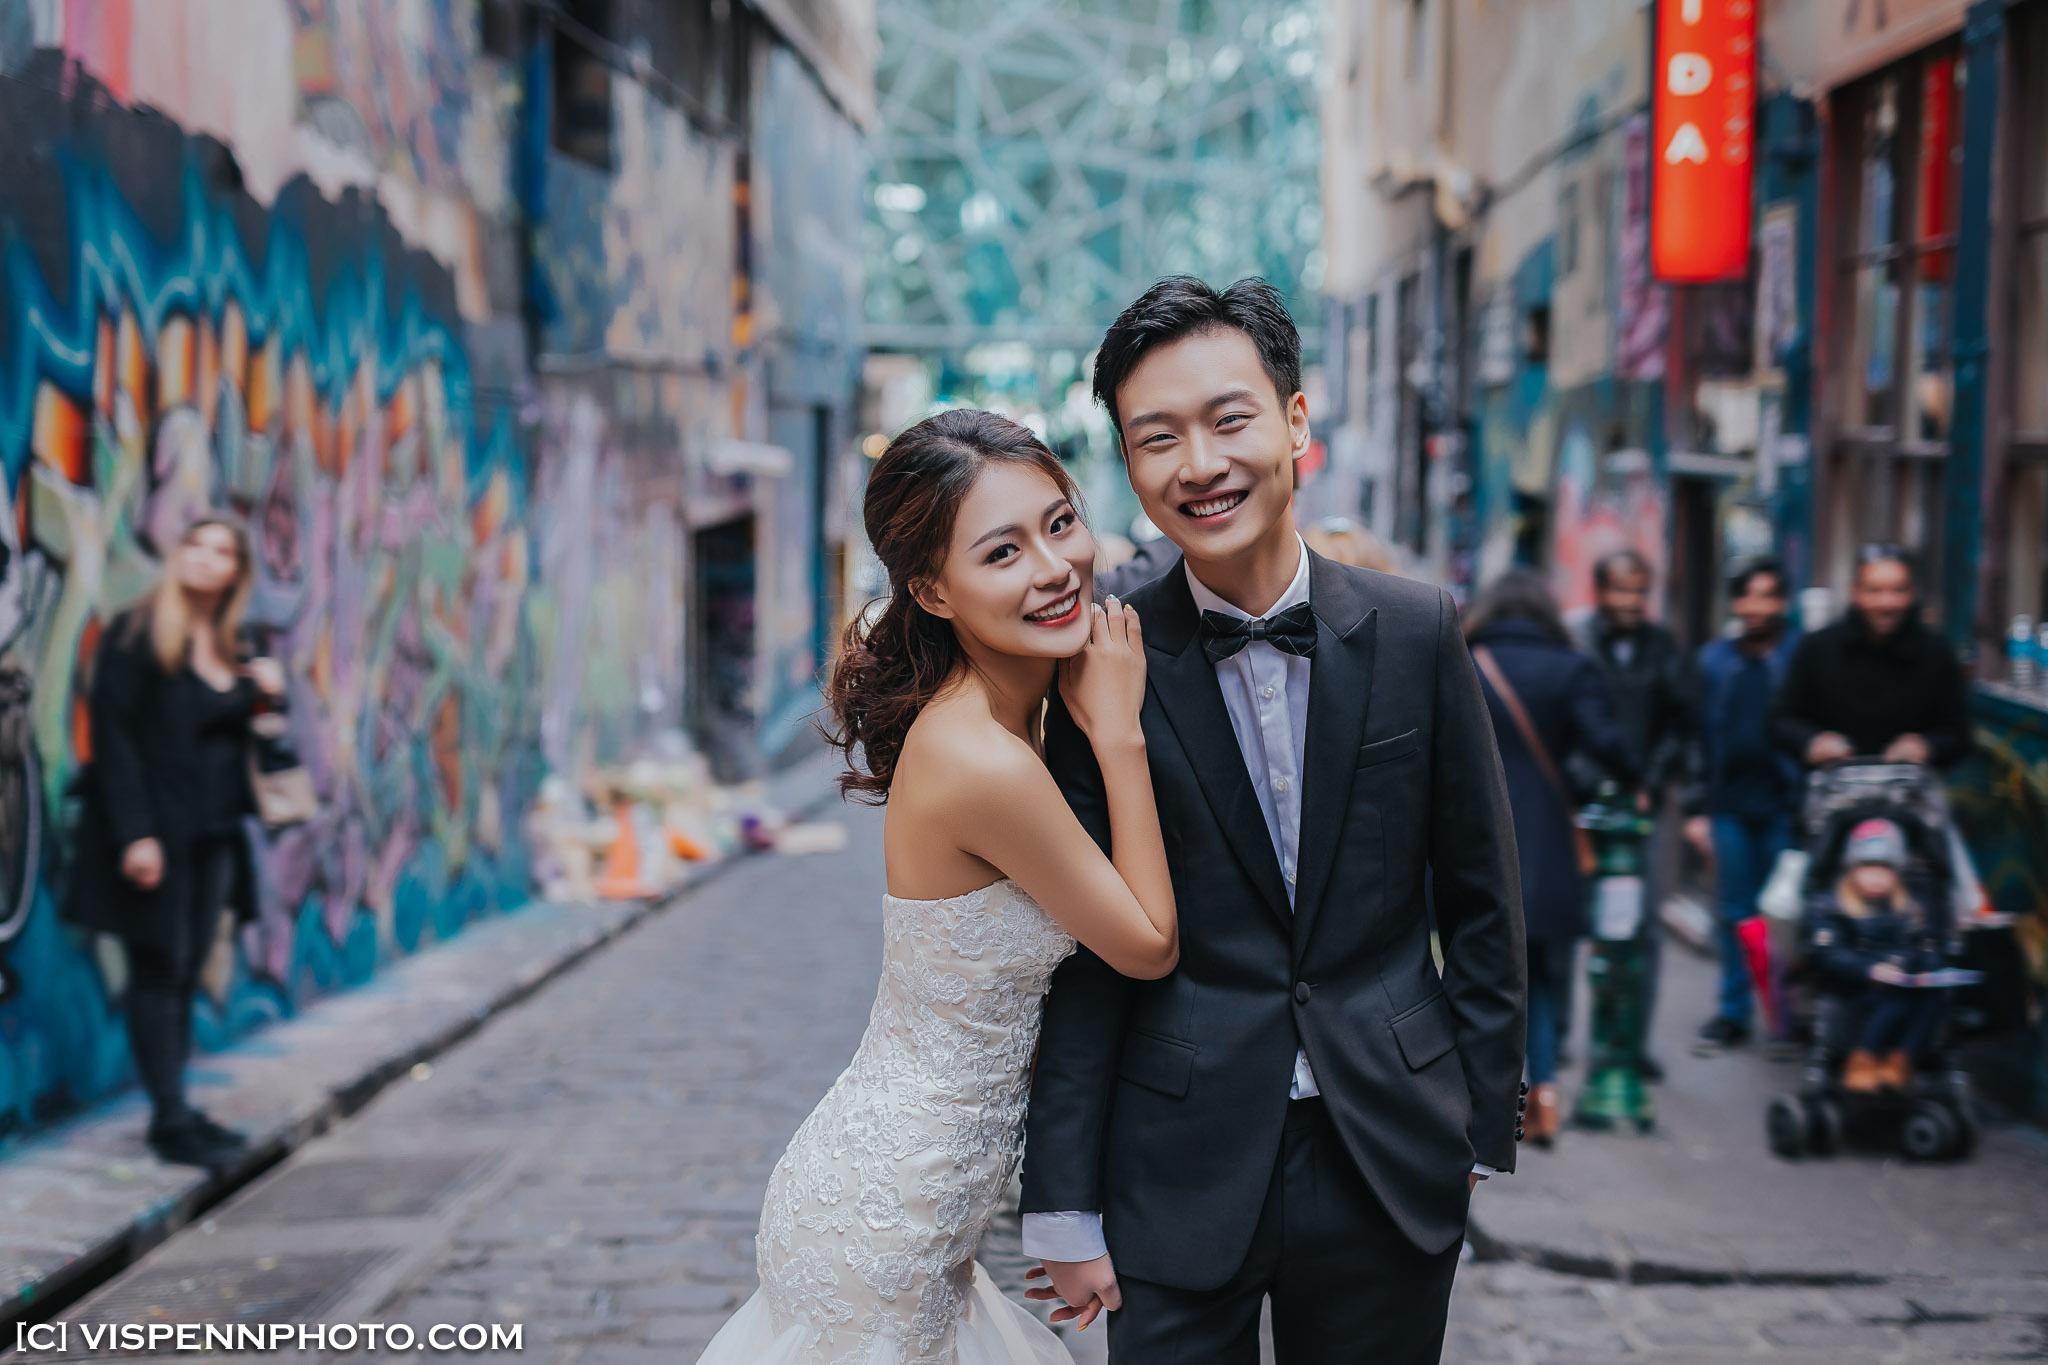 PRE WEDDING Photography Melbourne VISPENN 墨尔本 婚纱照 结婚照 婚纱摄影 5D5 4209